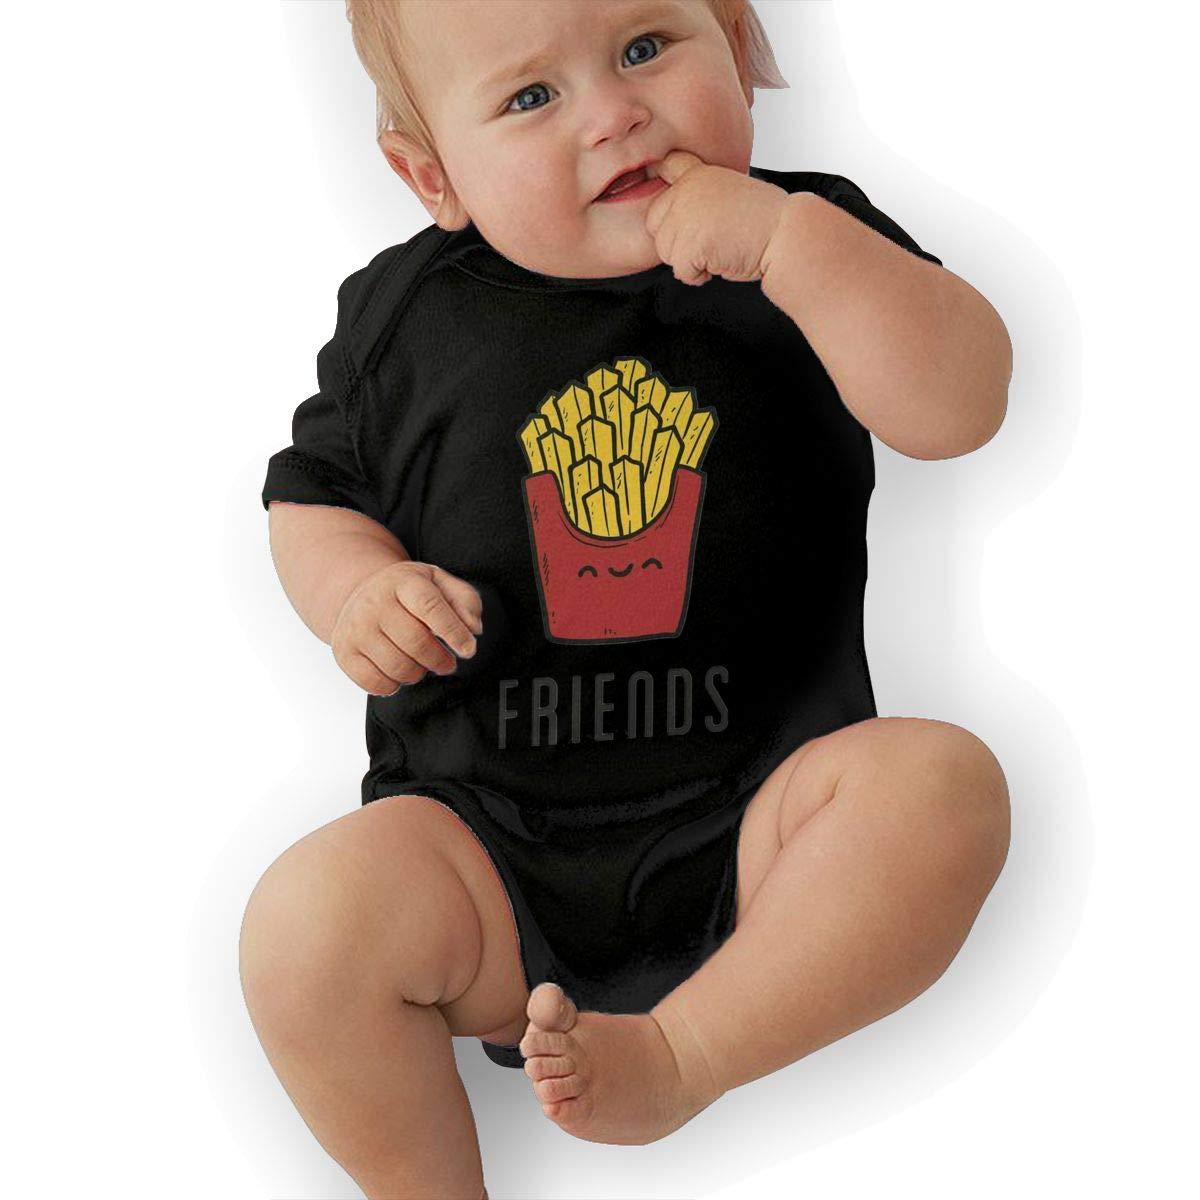 HappyLifea Cartoon Chips Newborn Baby Short Sleeve Romper Infant Summer Clothing